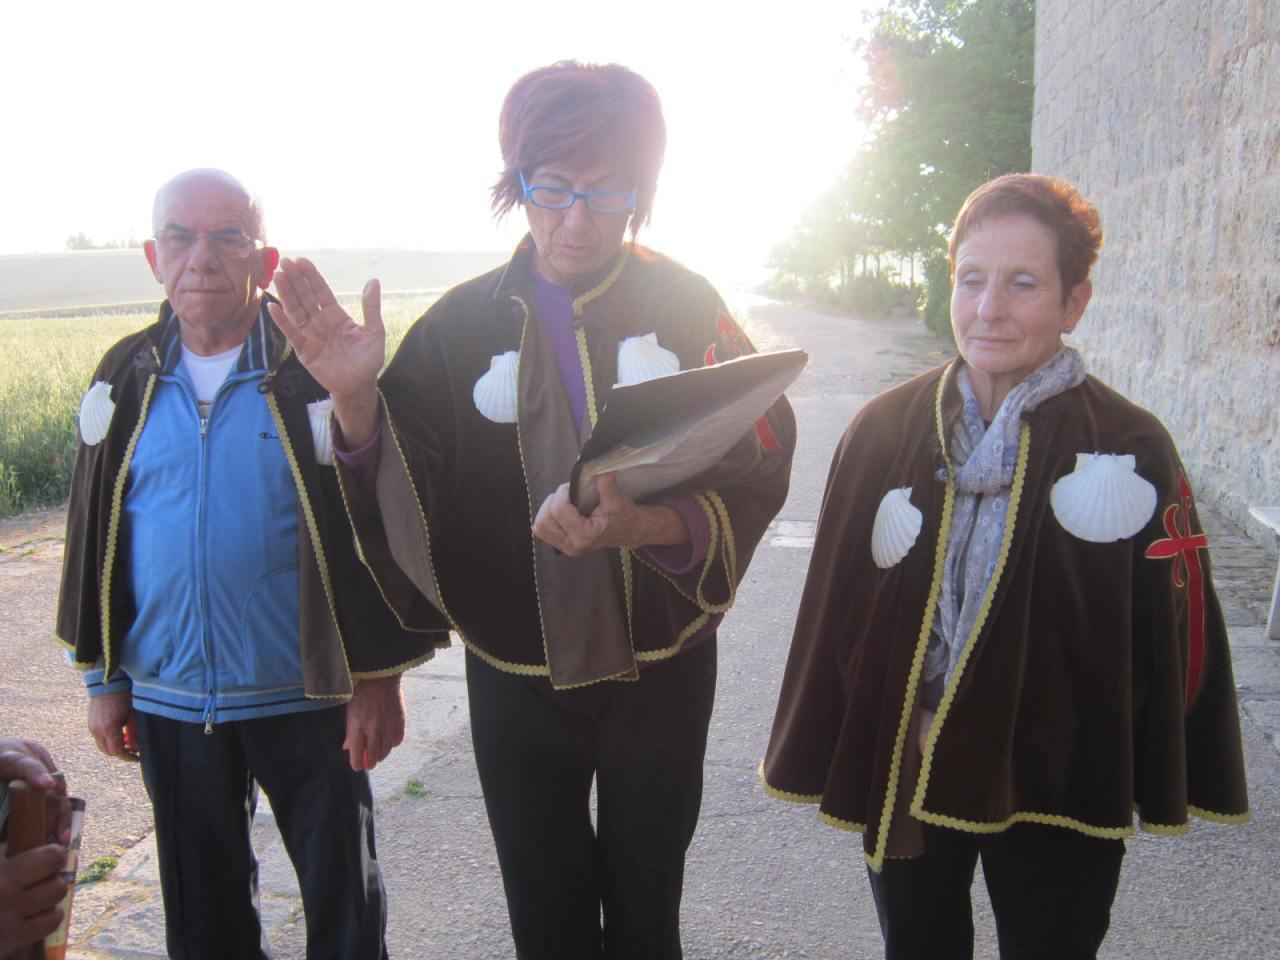 Morning prayers leaving the Ermita de San Nicolas